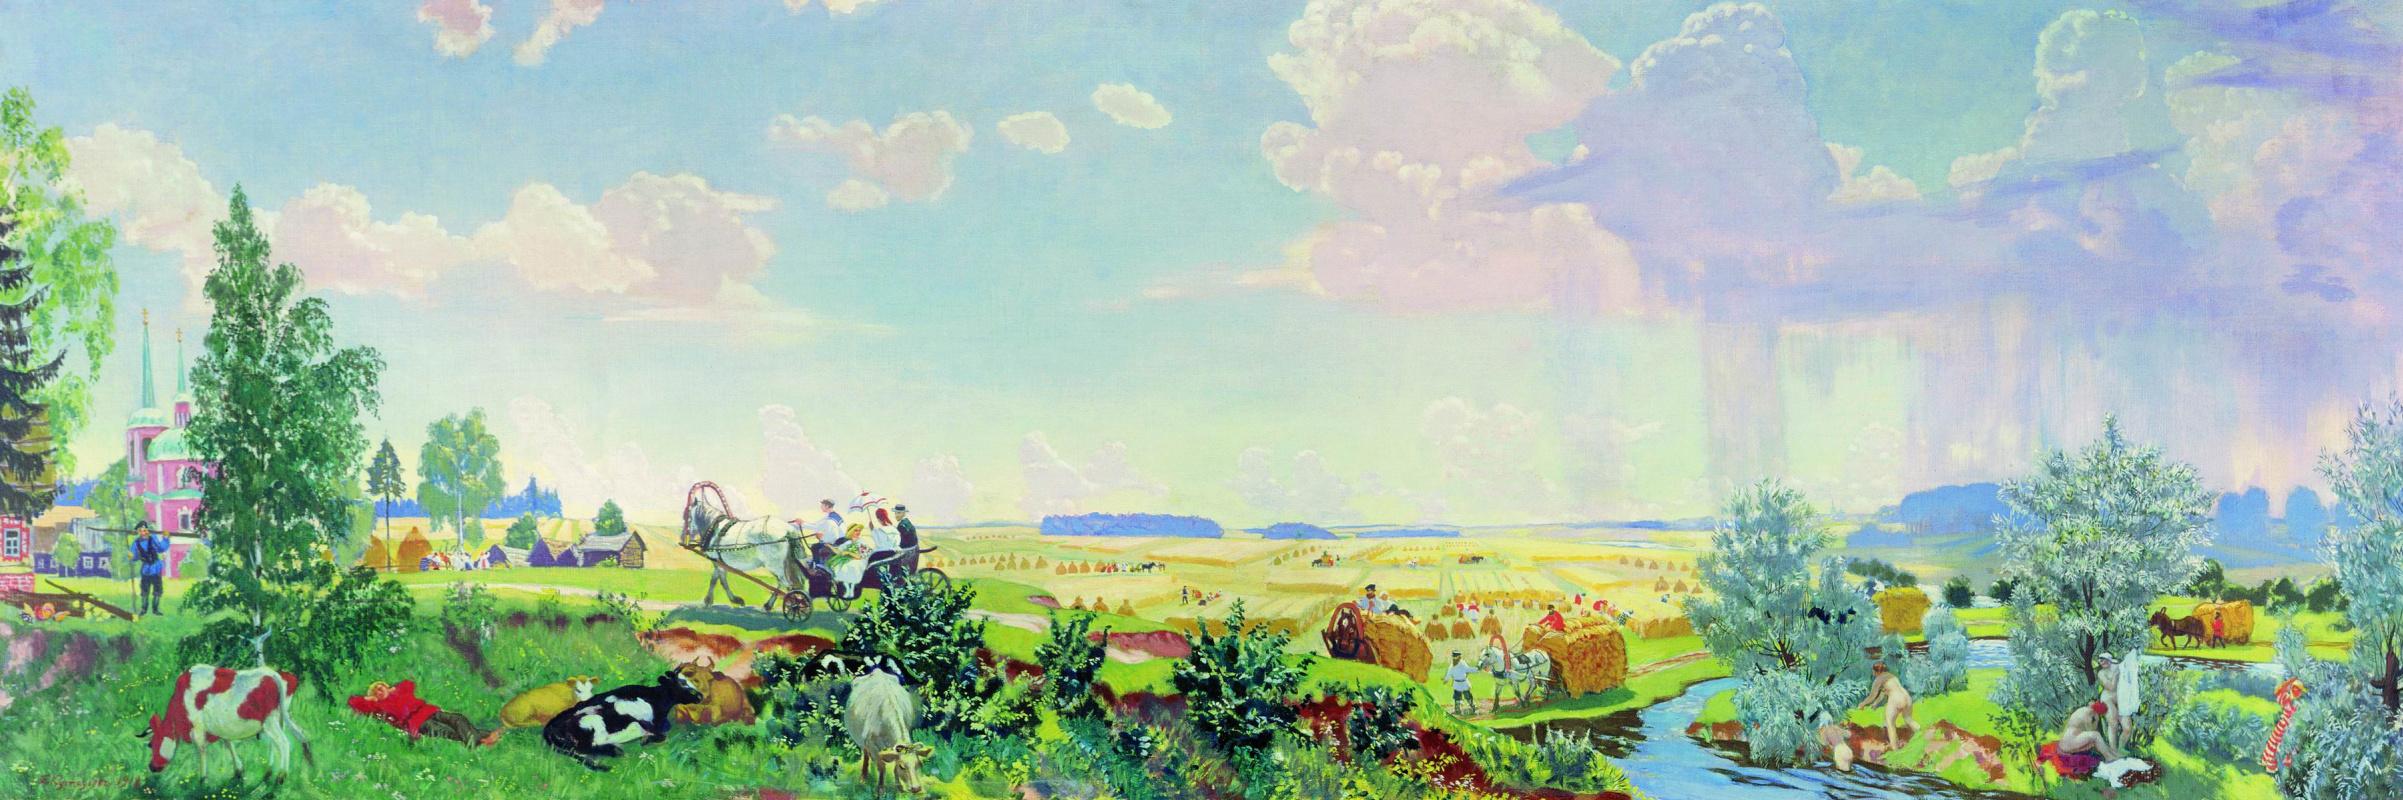 "Борис Михайлович Кустодиев. Лето (Поездка в ""Терем"")"